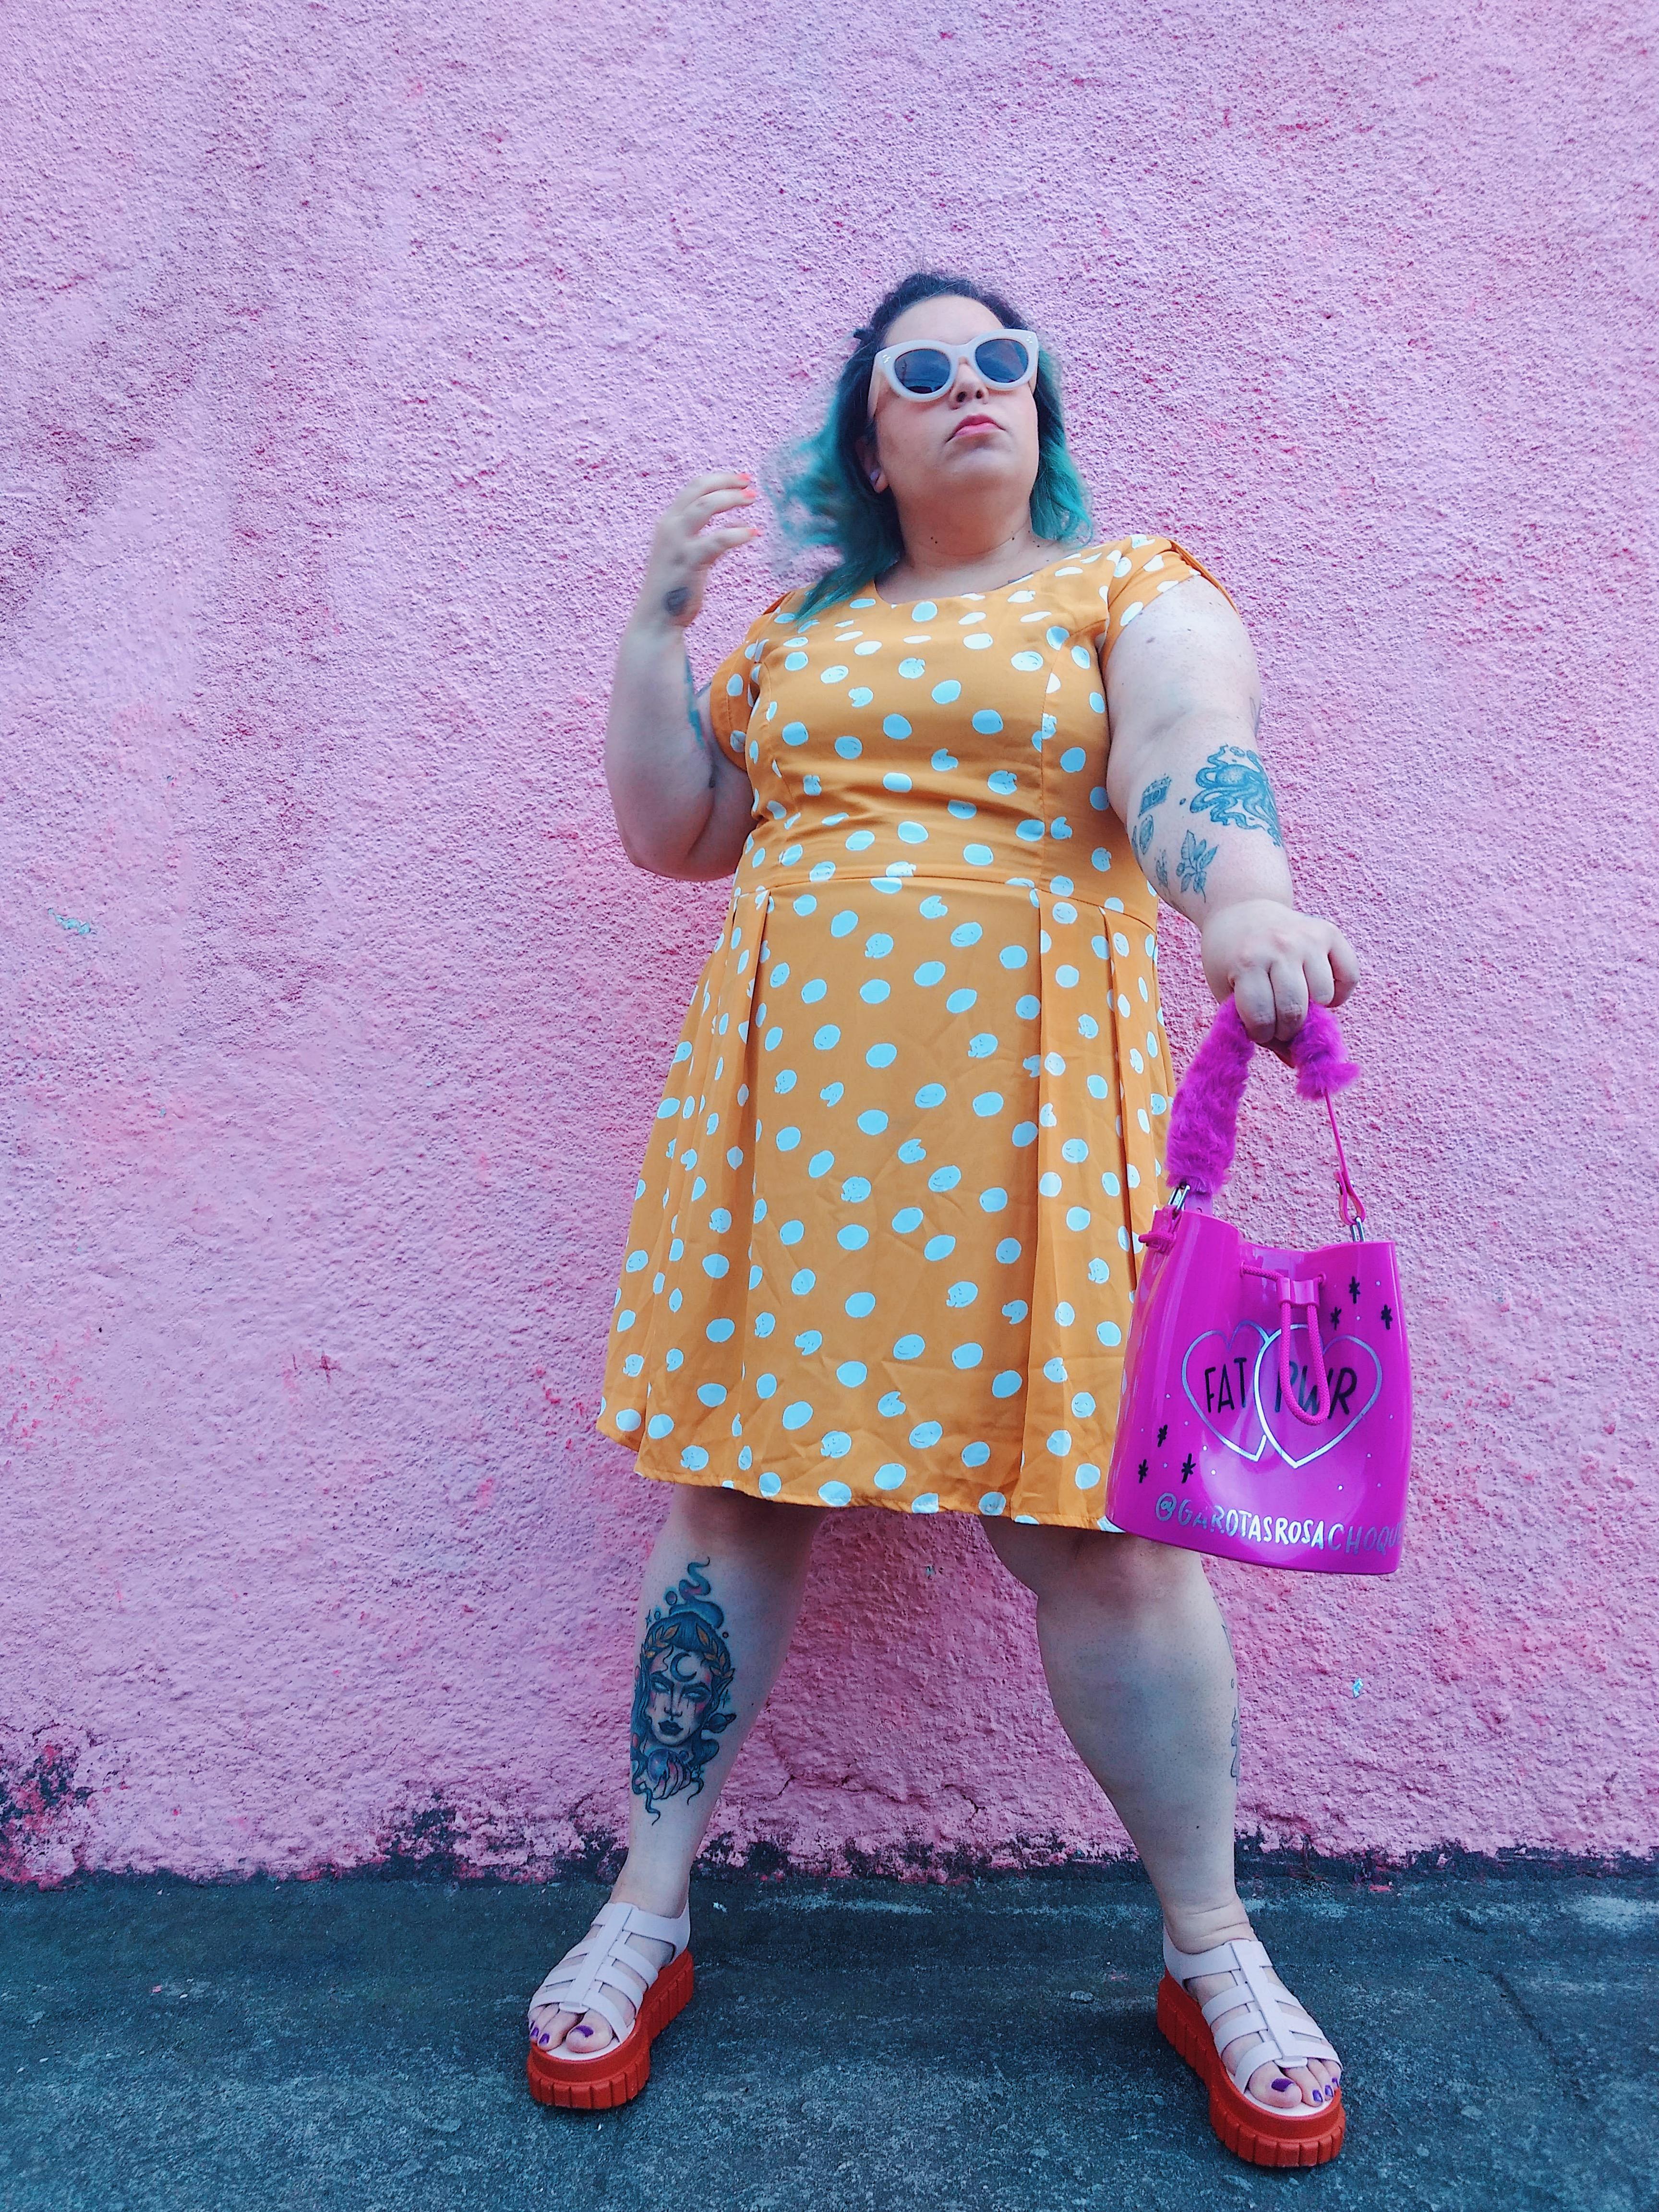 vestido plus size na cor mostarda com poá branco plus size chica bolacha